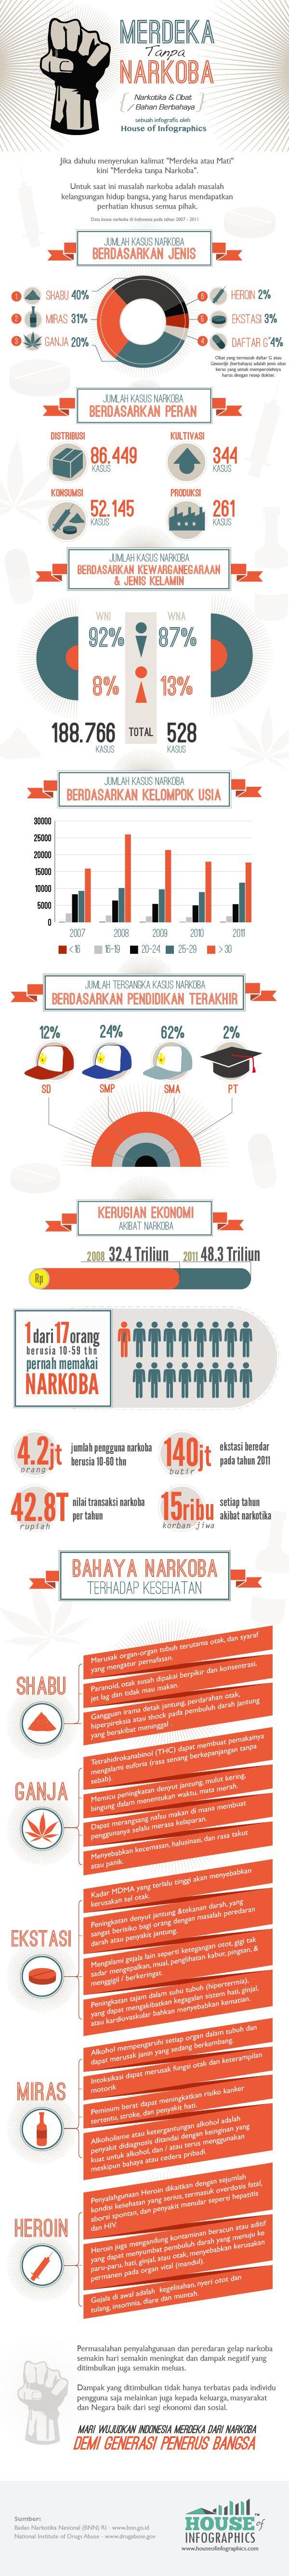 Infografis: Indonesia Merdeka Tanpa Narkoba - House of Infographics, June 2013